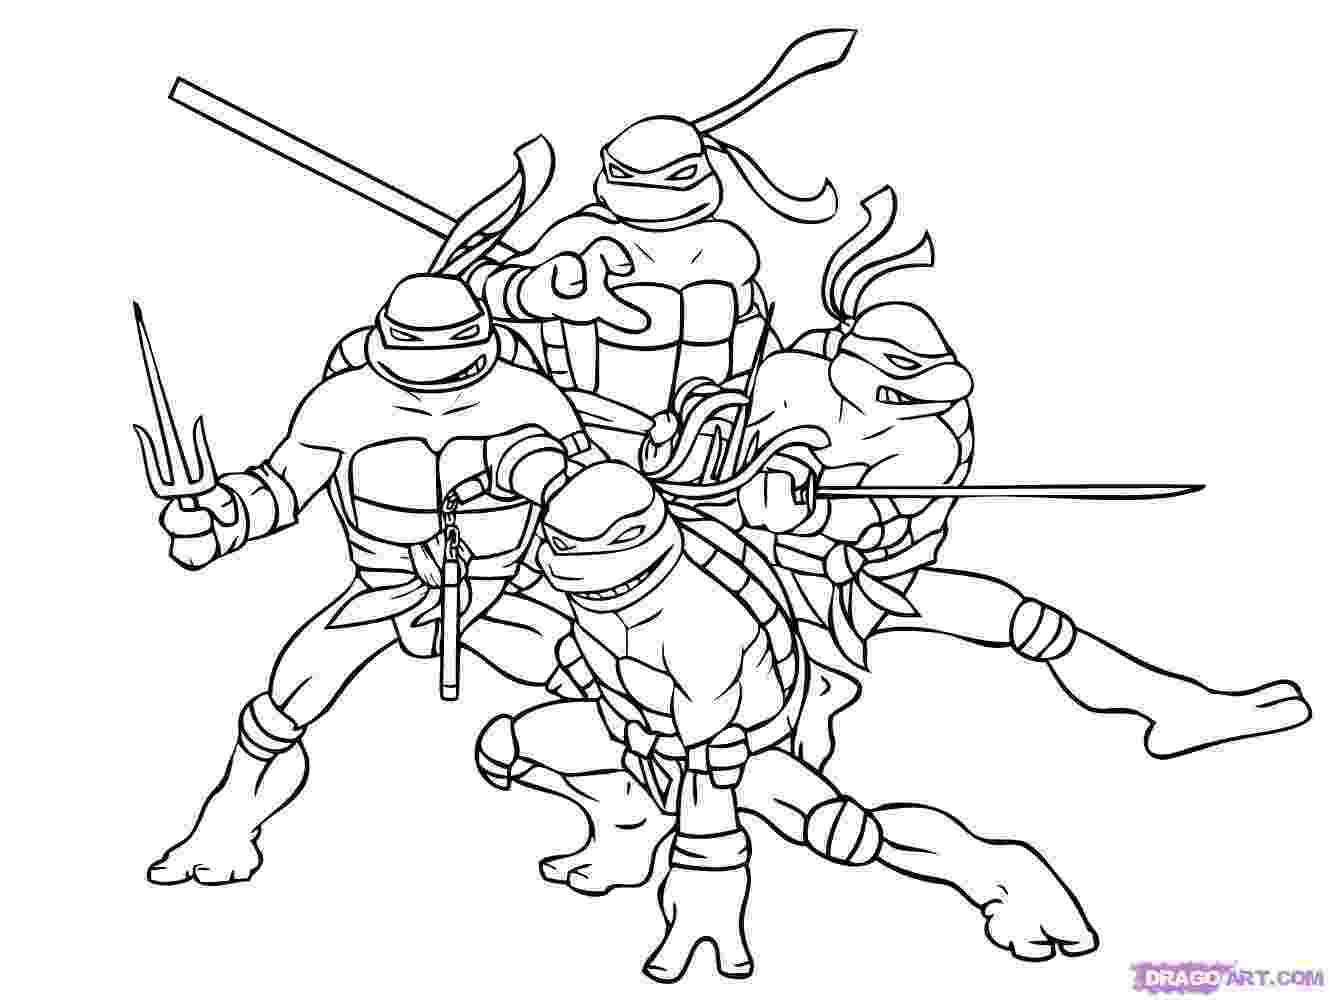 ninja turtles free coloring pages get this teenage mutant ninja turtles coloring pages free ninja turtles pages free coloring